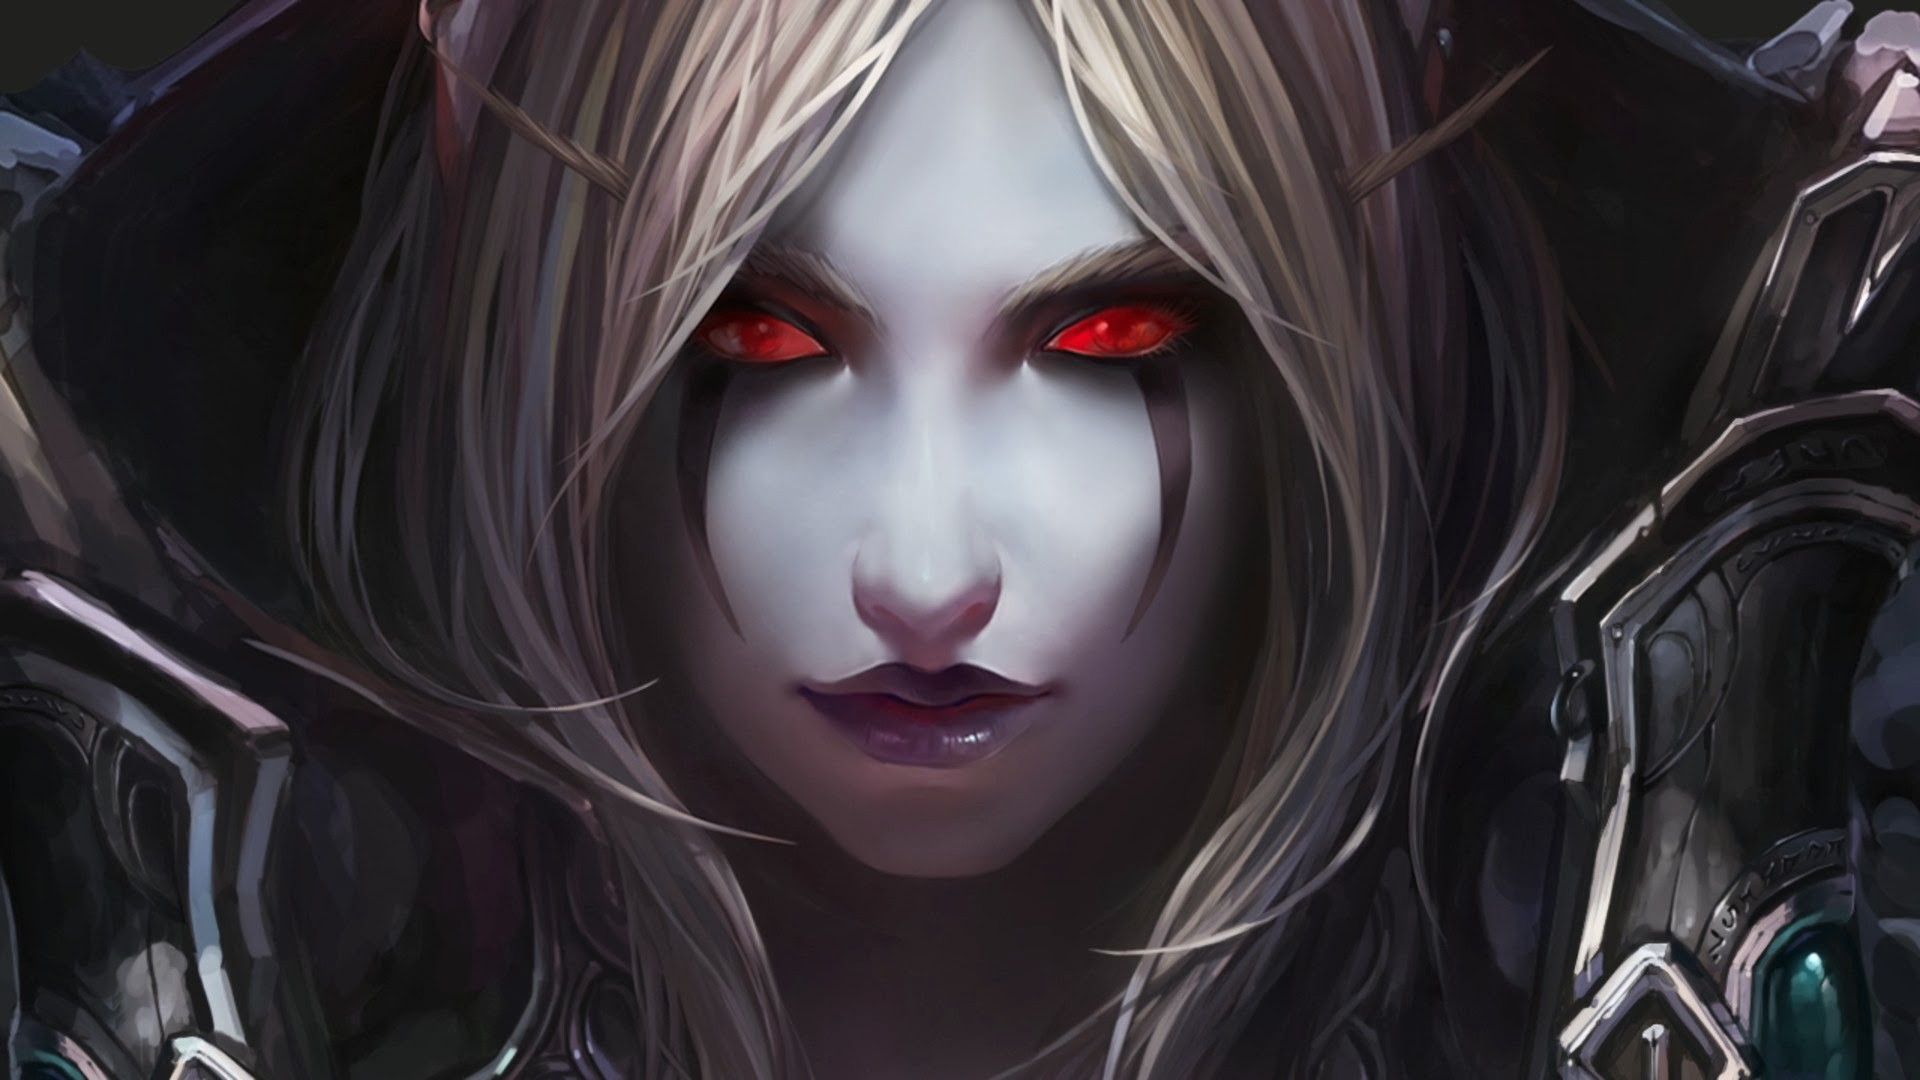 Res: 1920x1080, beautiful-demon-girl-red-eyes-wallpaper-hd-